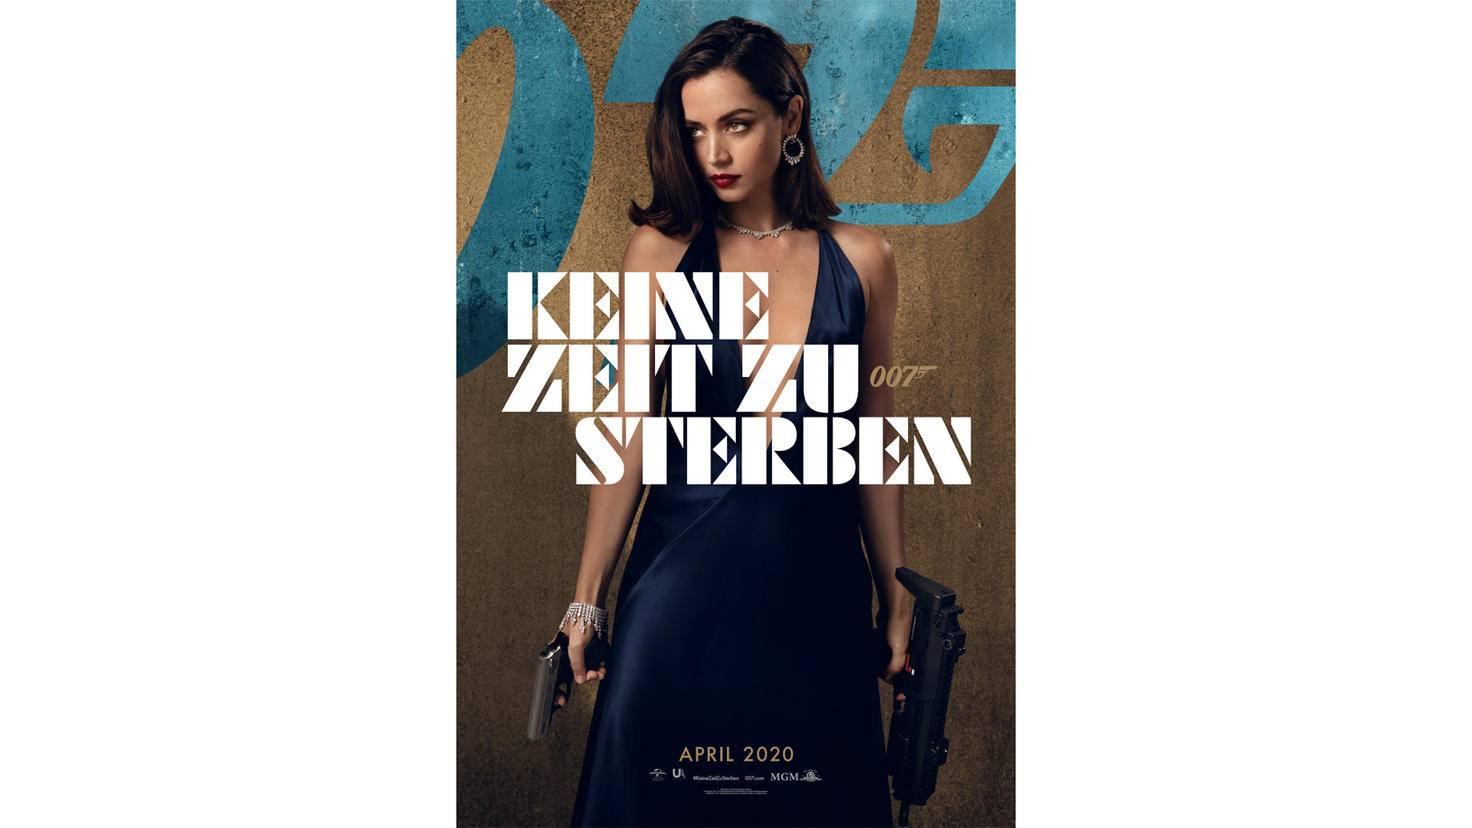 James Bond Keine Zeit zu sterben Ana de Armas Charakterposter